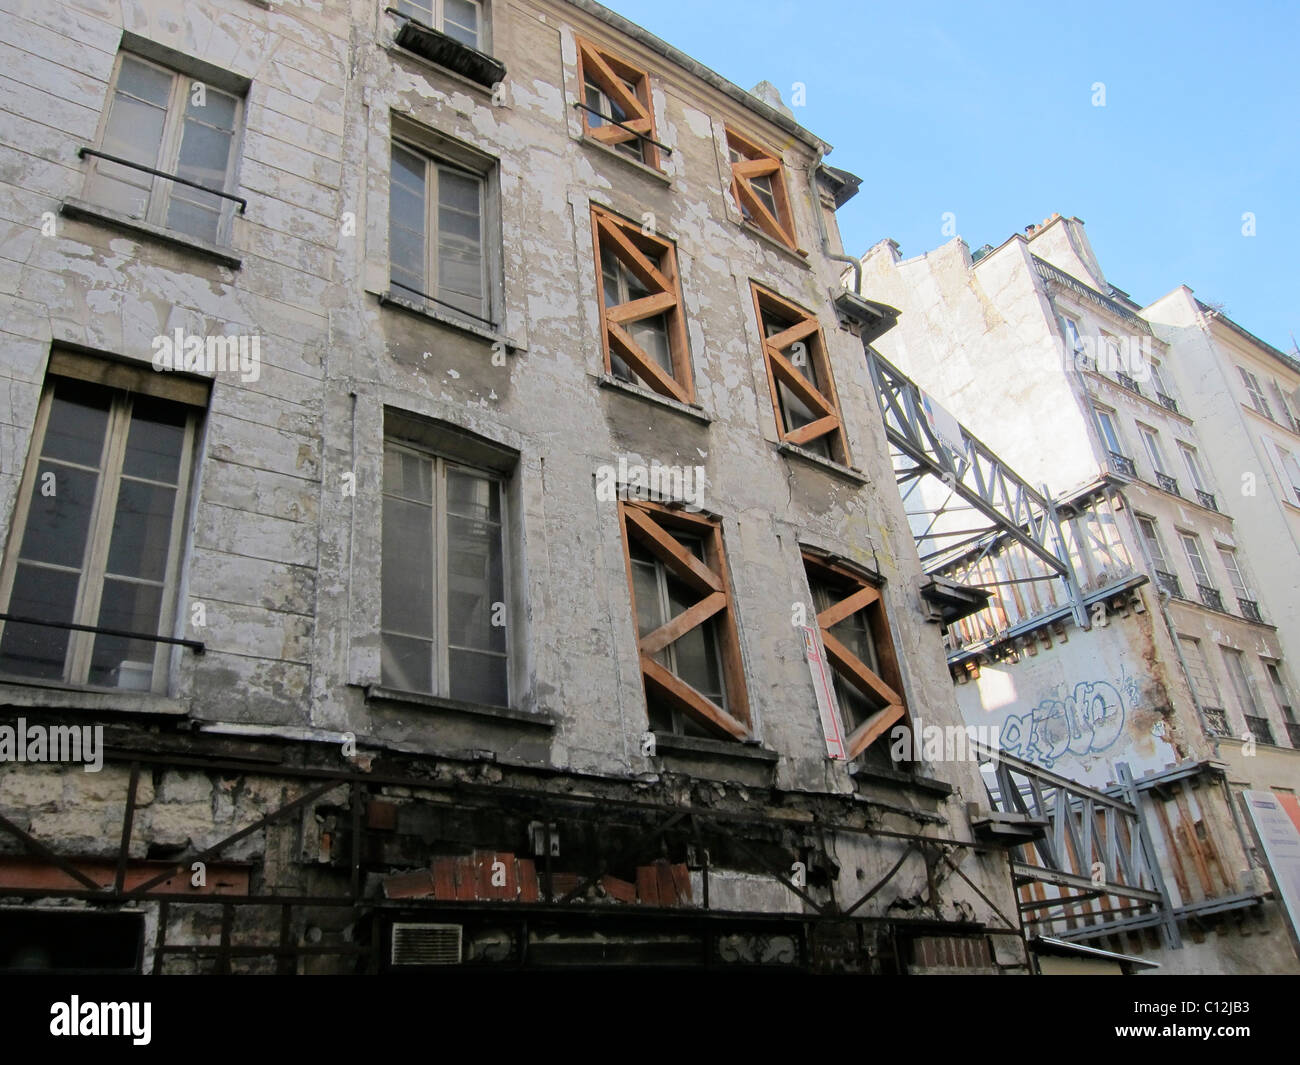 Paris France Old Apartment Building in Bad